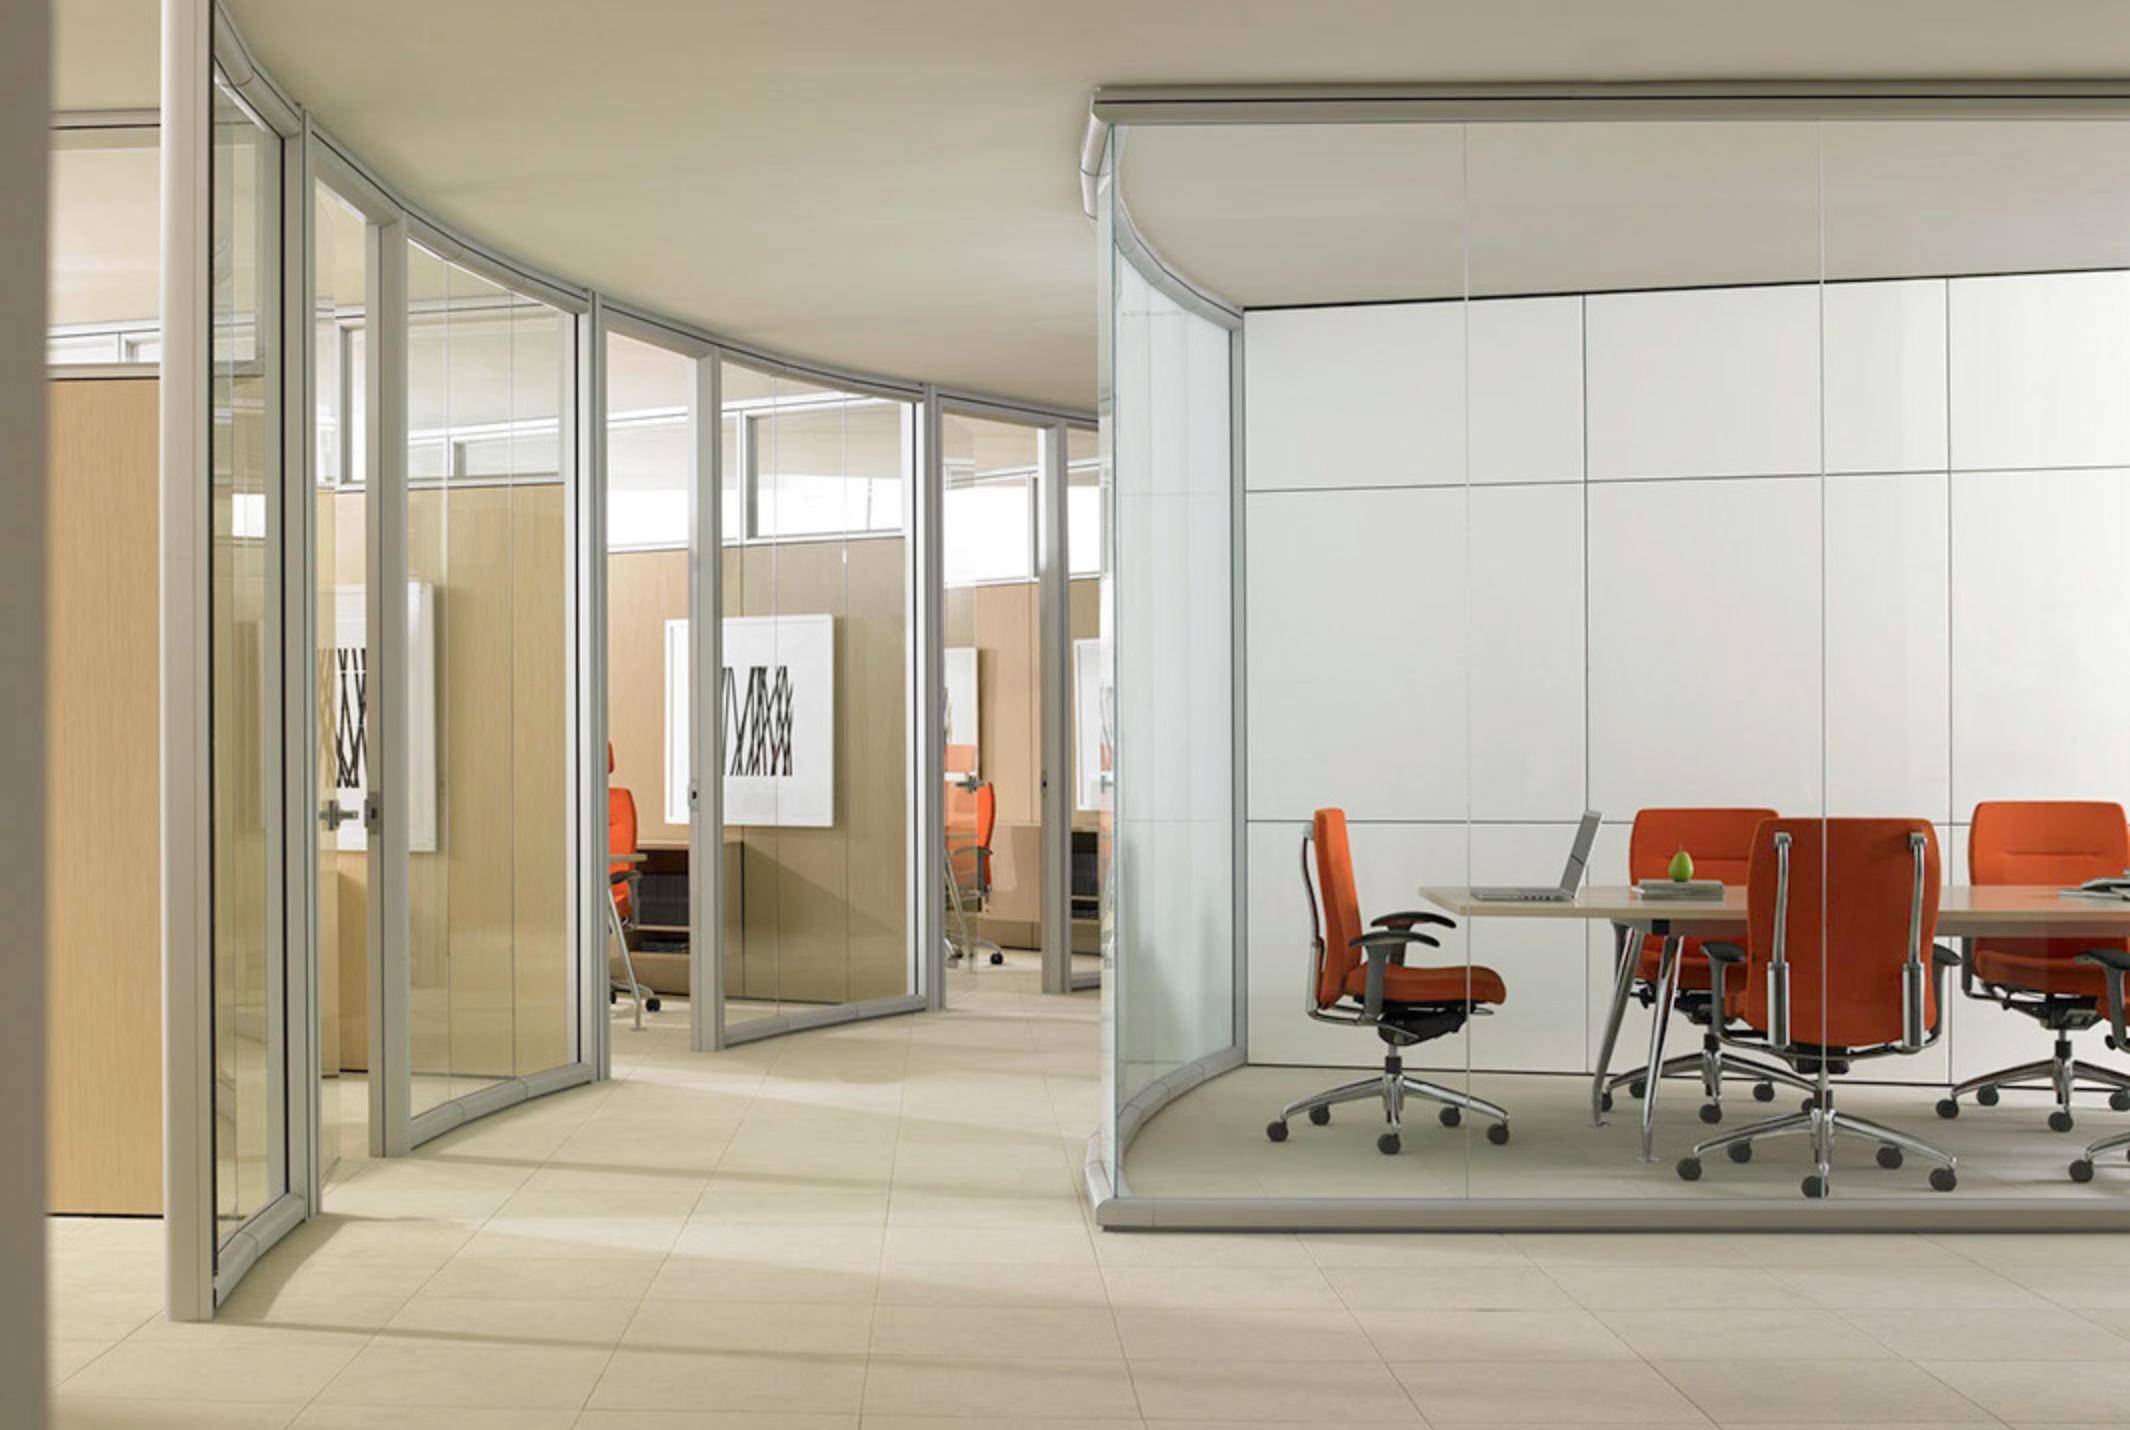 WO_Office-Orange Chairs